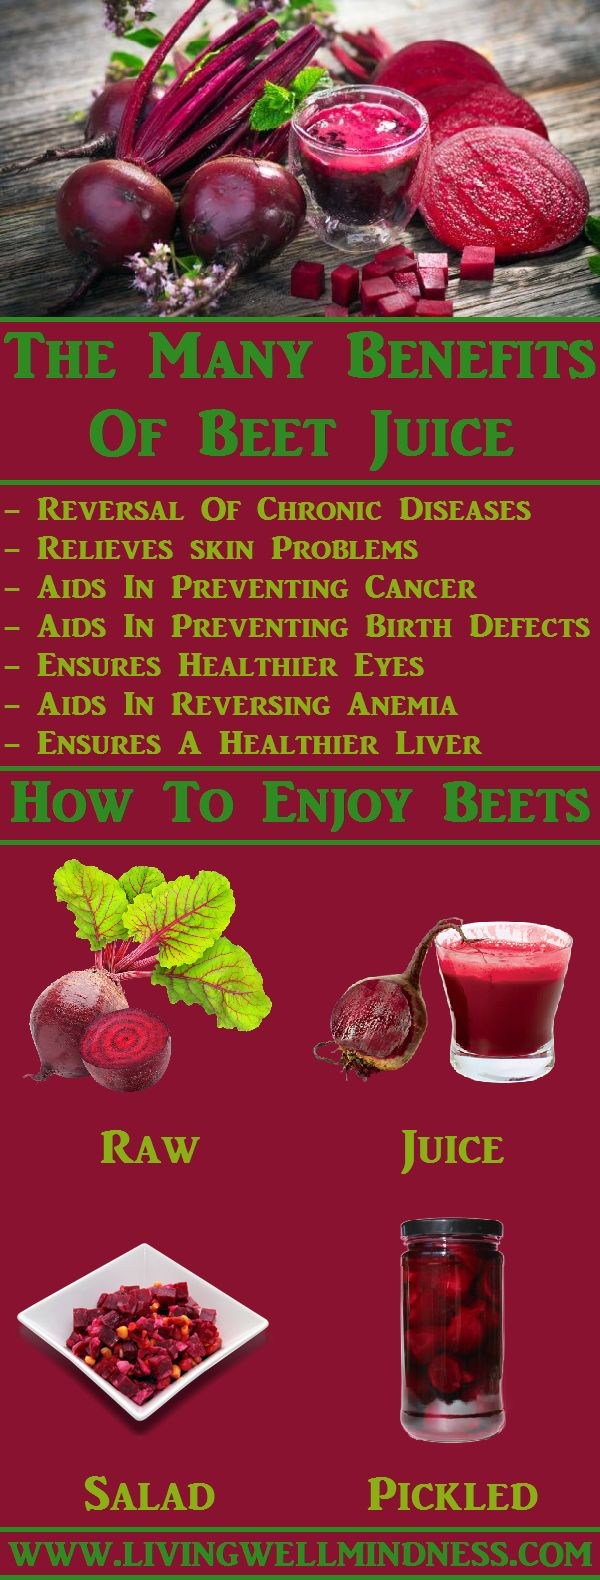 I love beets!